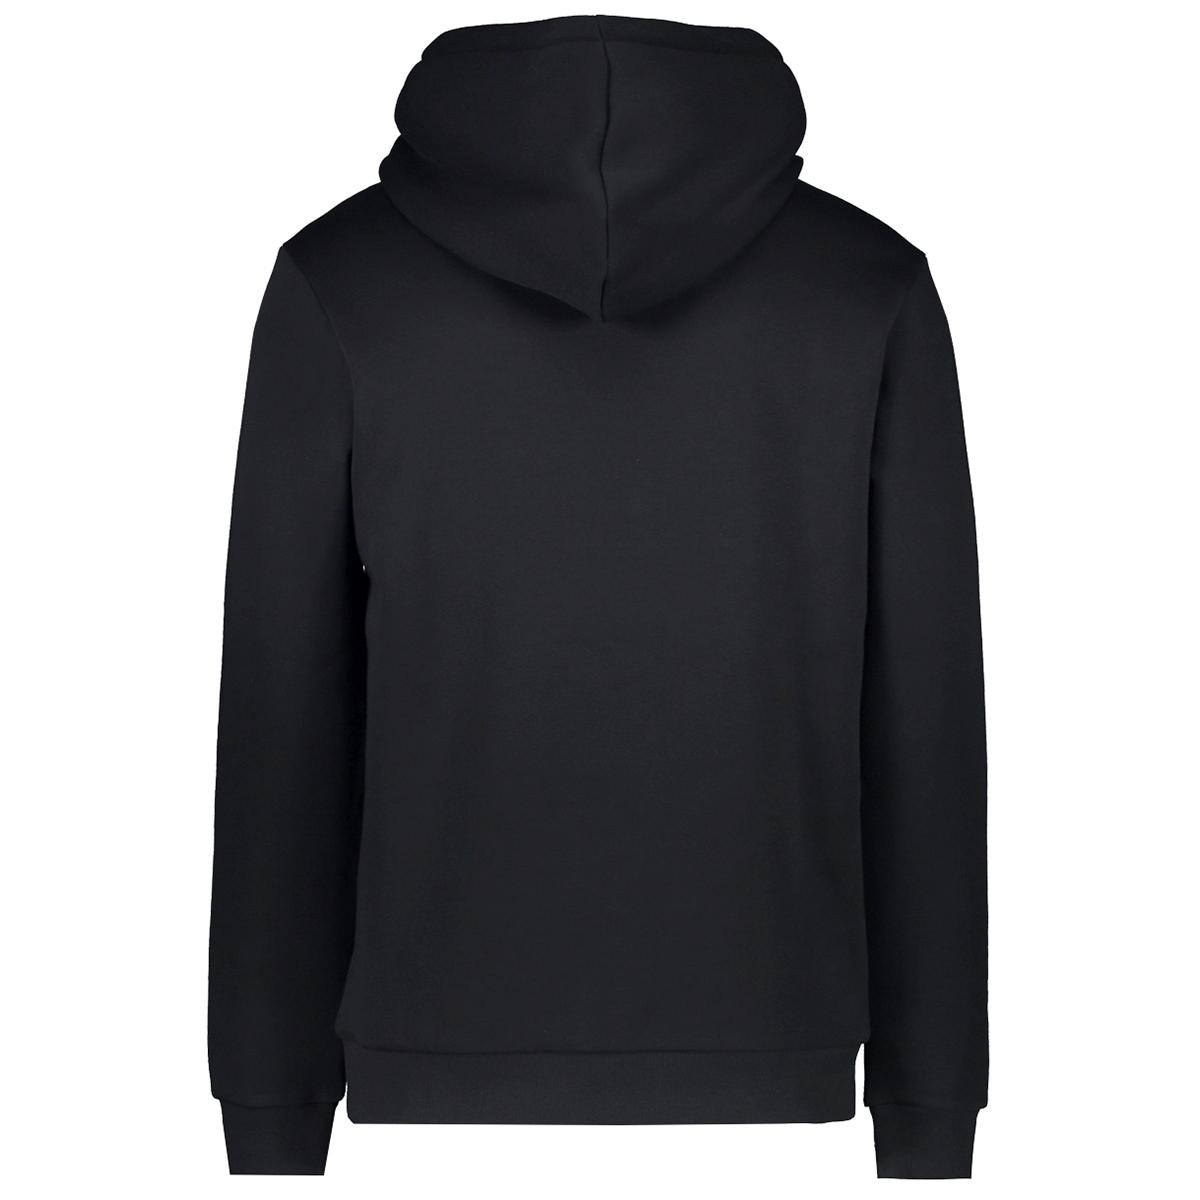 bryant sw hood 4351001 cars sweater black